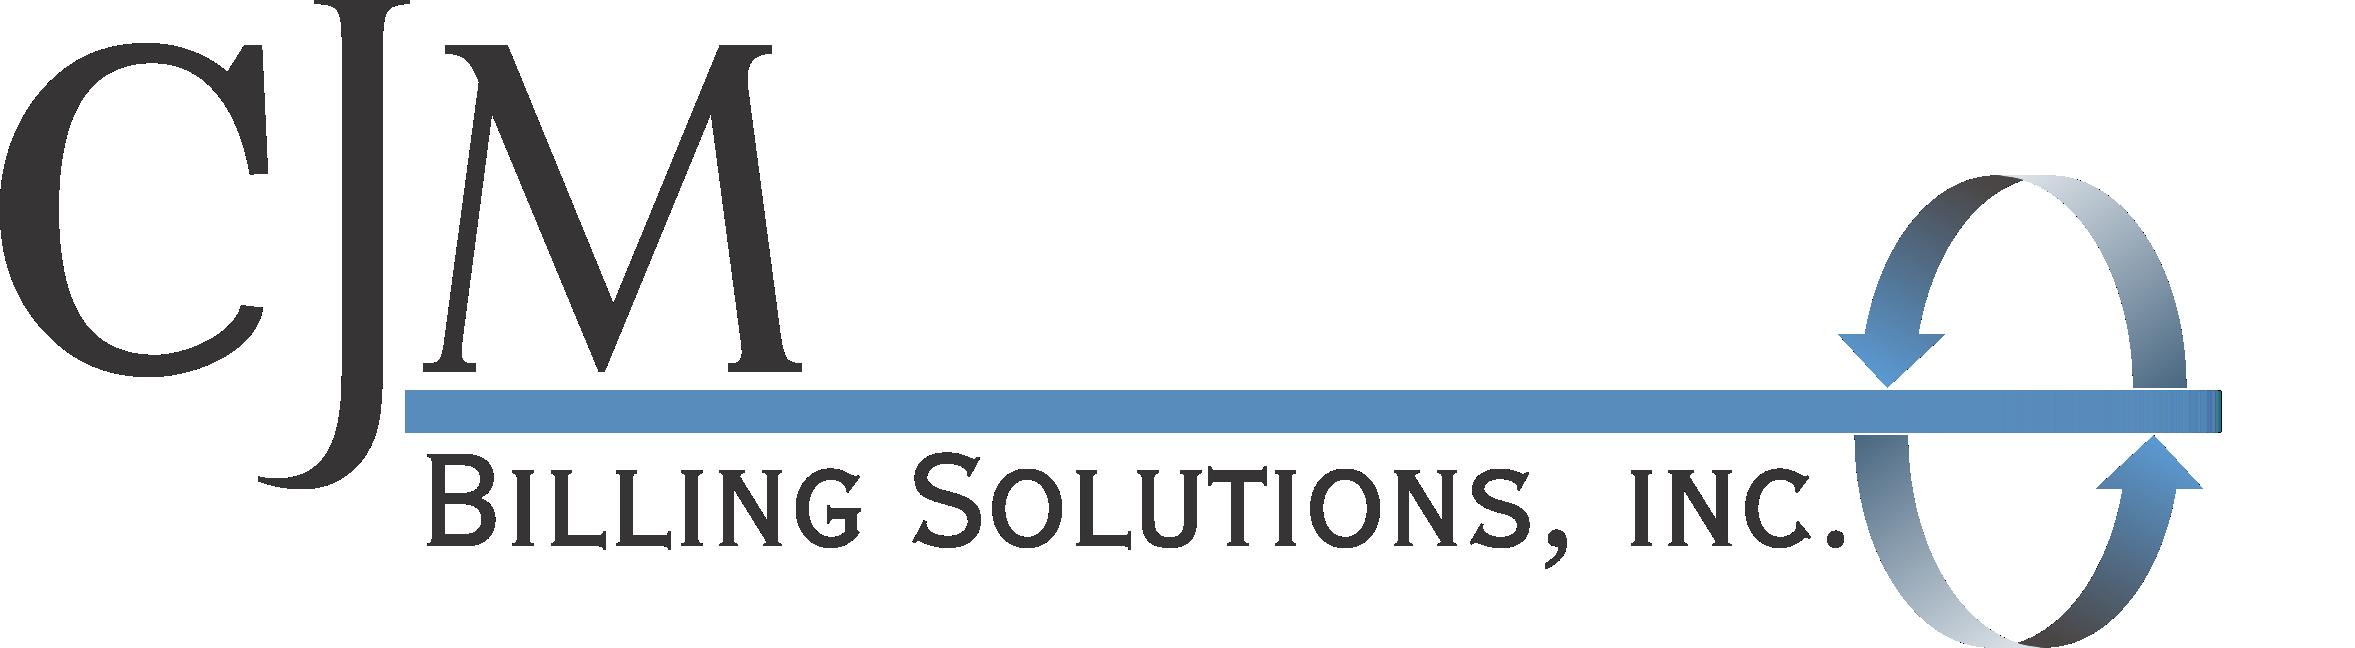 Logoclearcjm